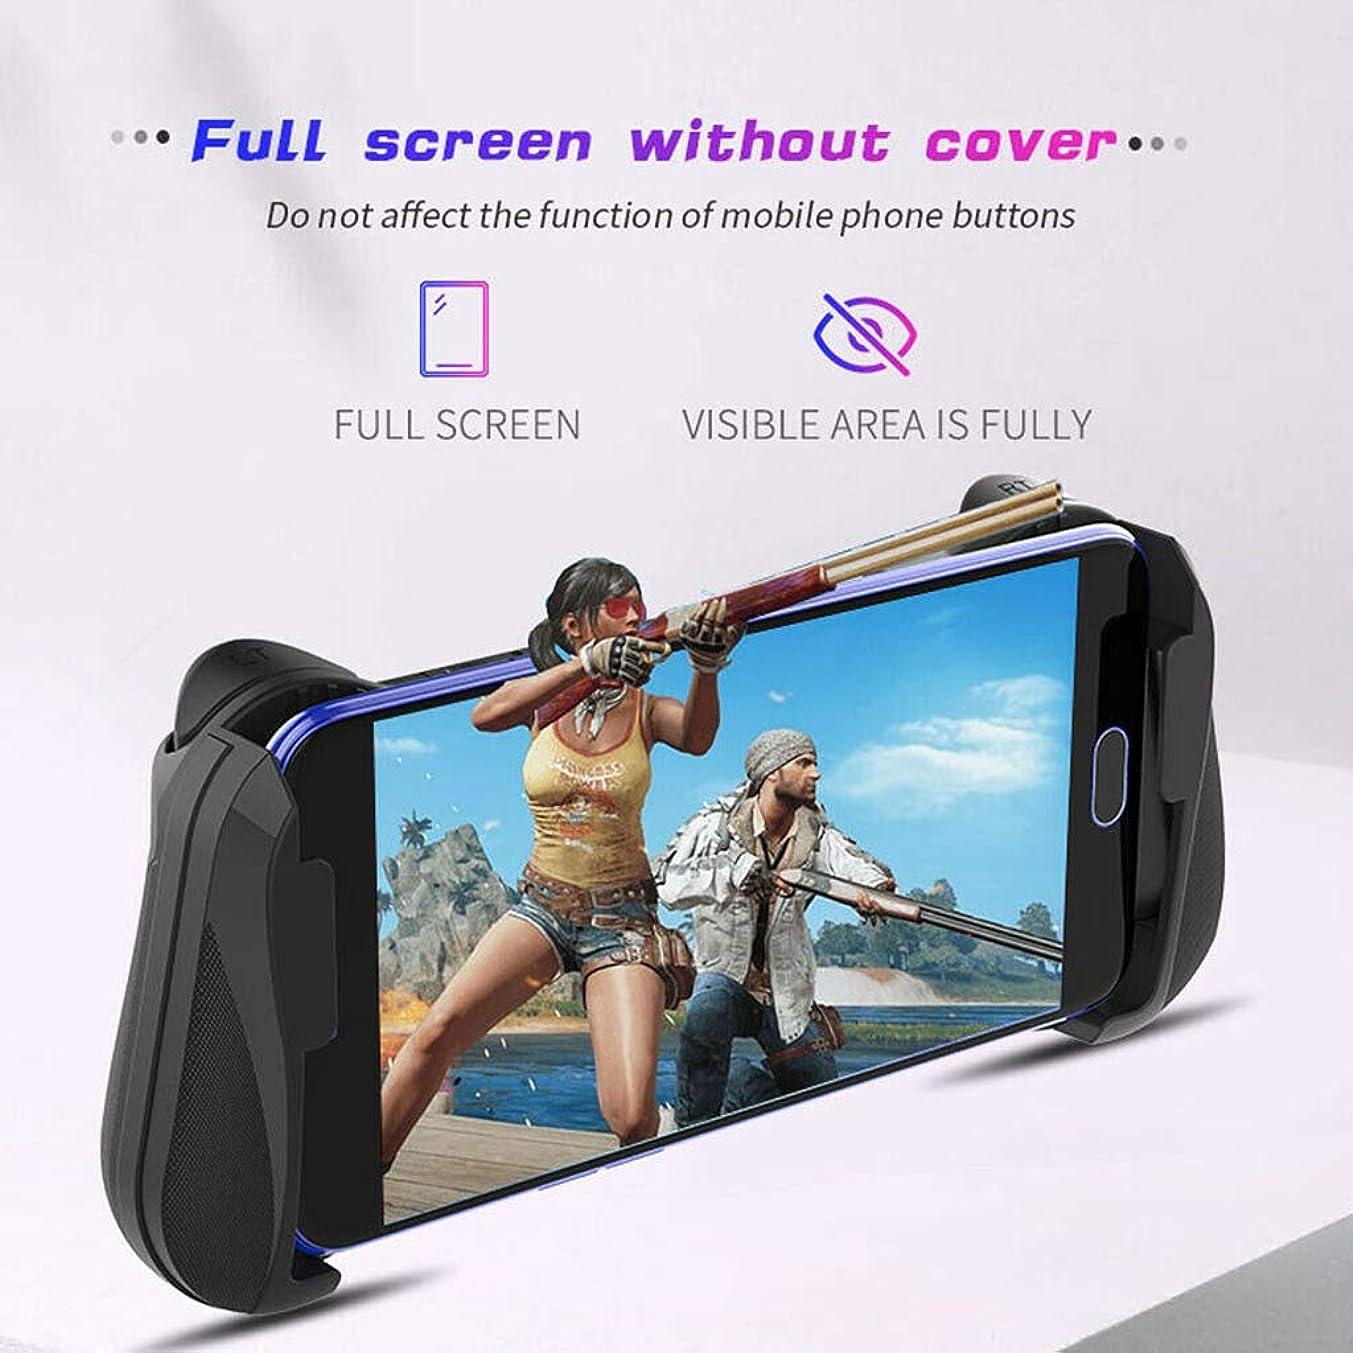 Tebatu Wireless Gamepad Gaming Controller Joystick for Android for iOS Smartphones